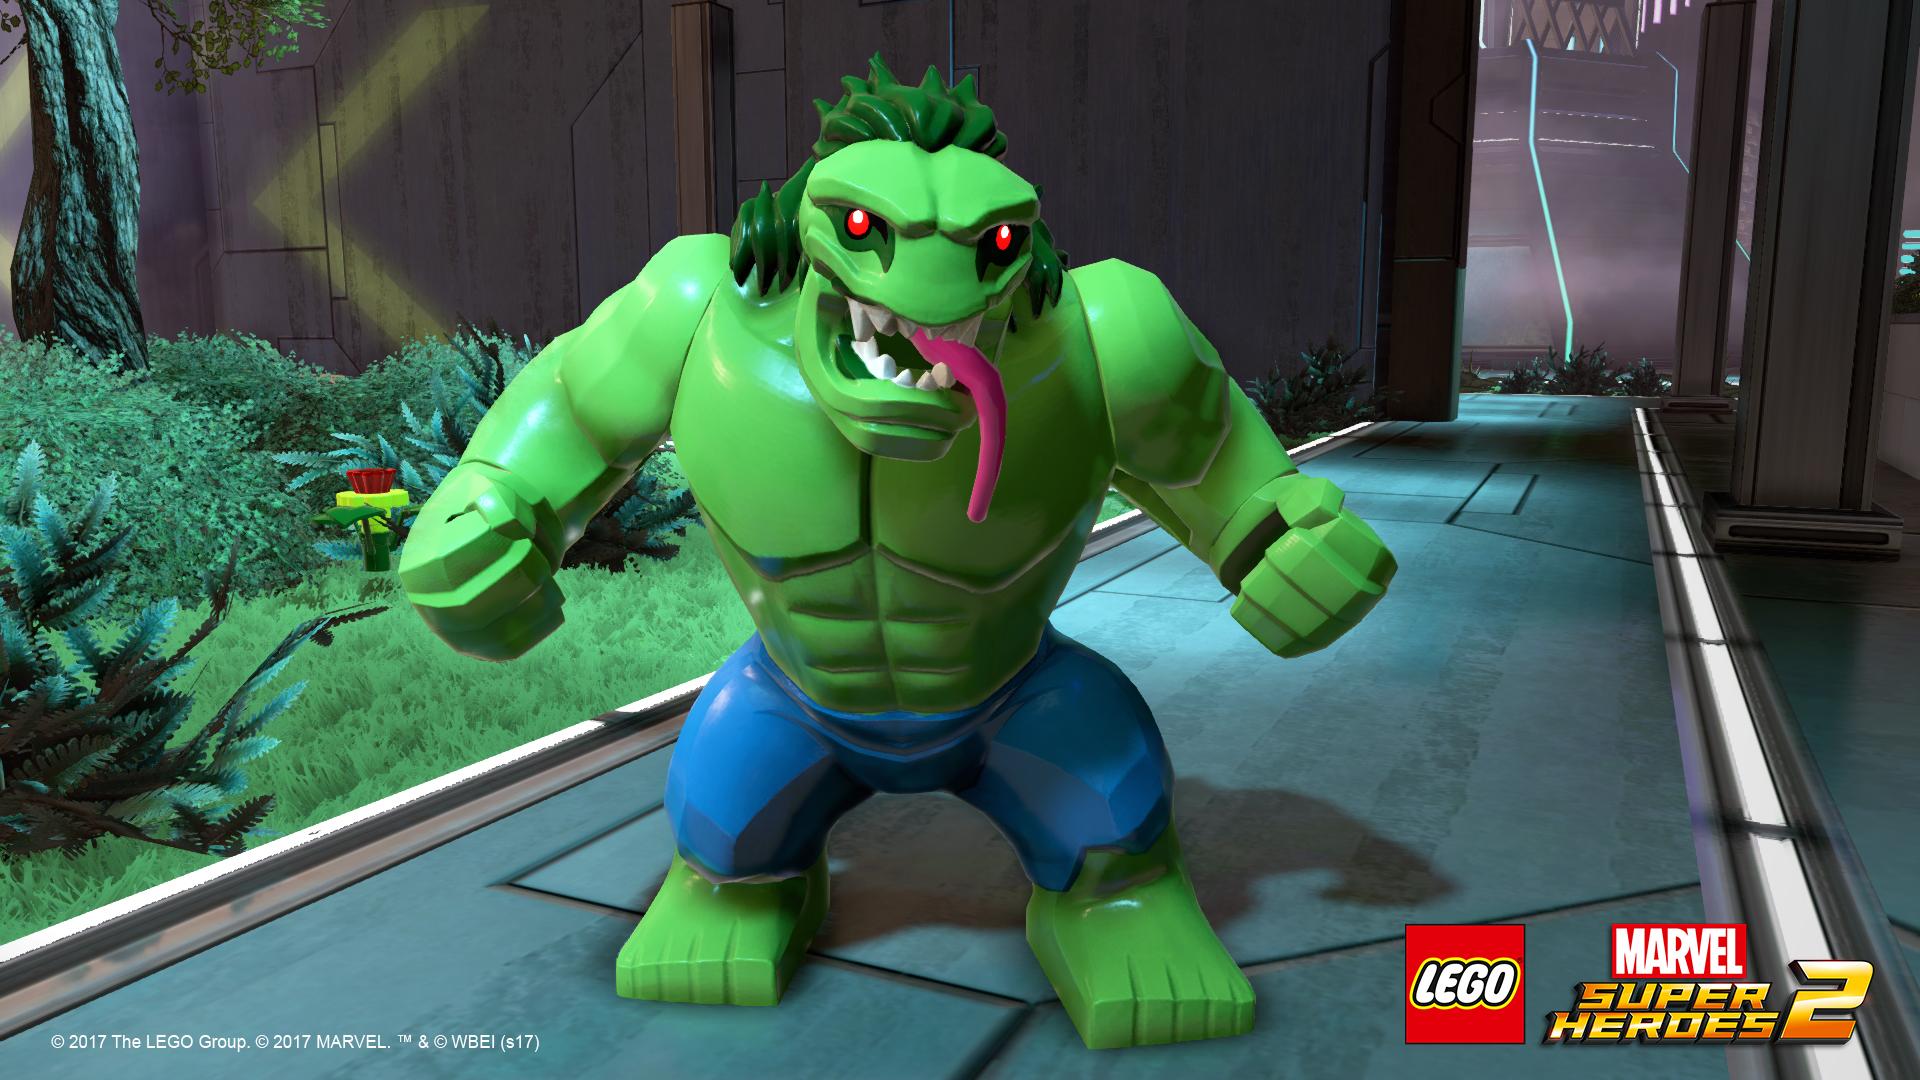 LEGO_Marvel_Super_Heroes_2_-_Hulk_2099_1507794993